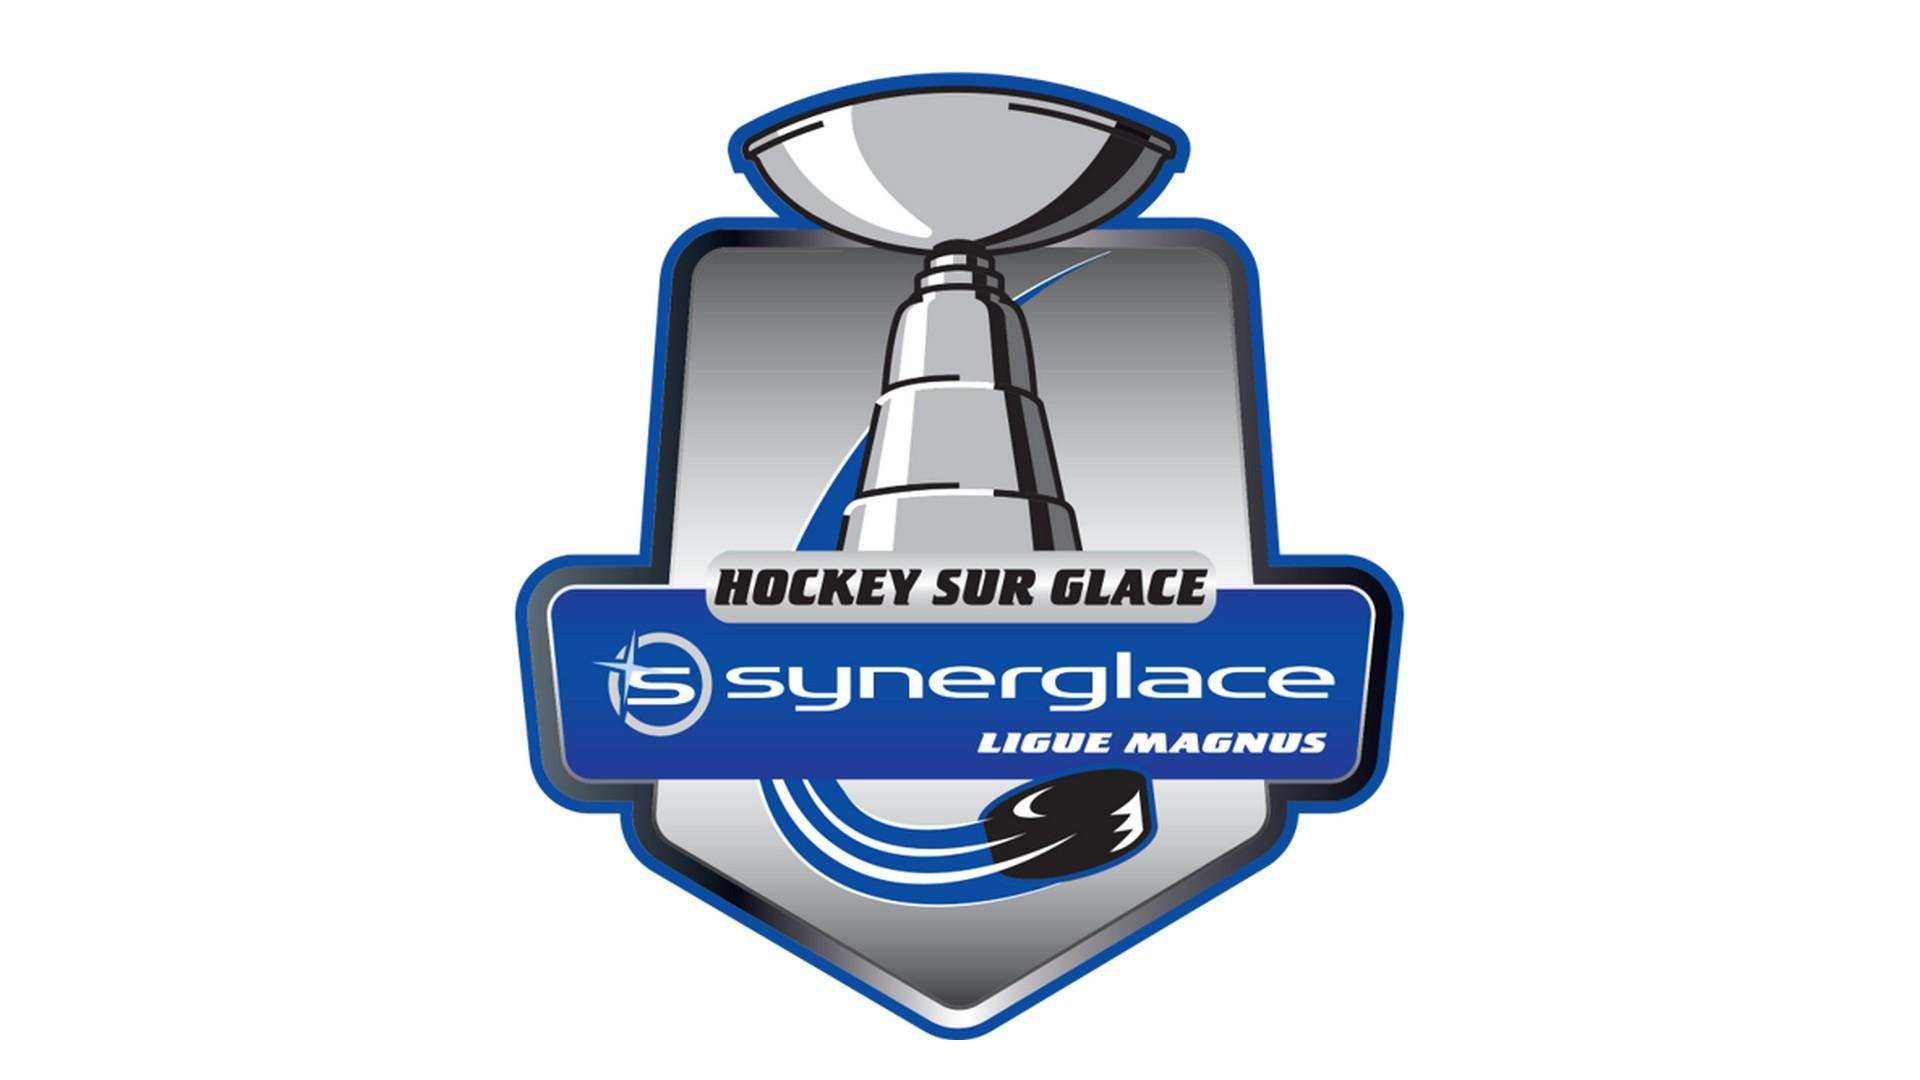 Synerglace x Ligue Magnus (hockey-sur-glace) 2021